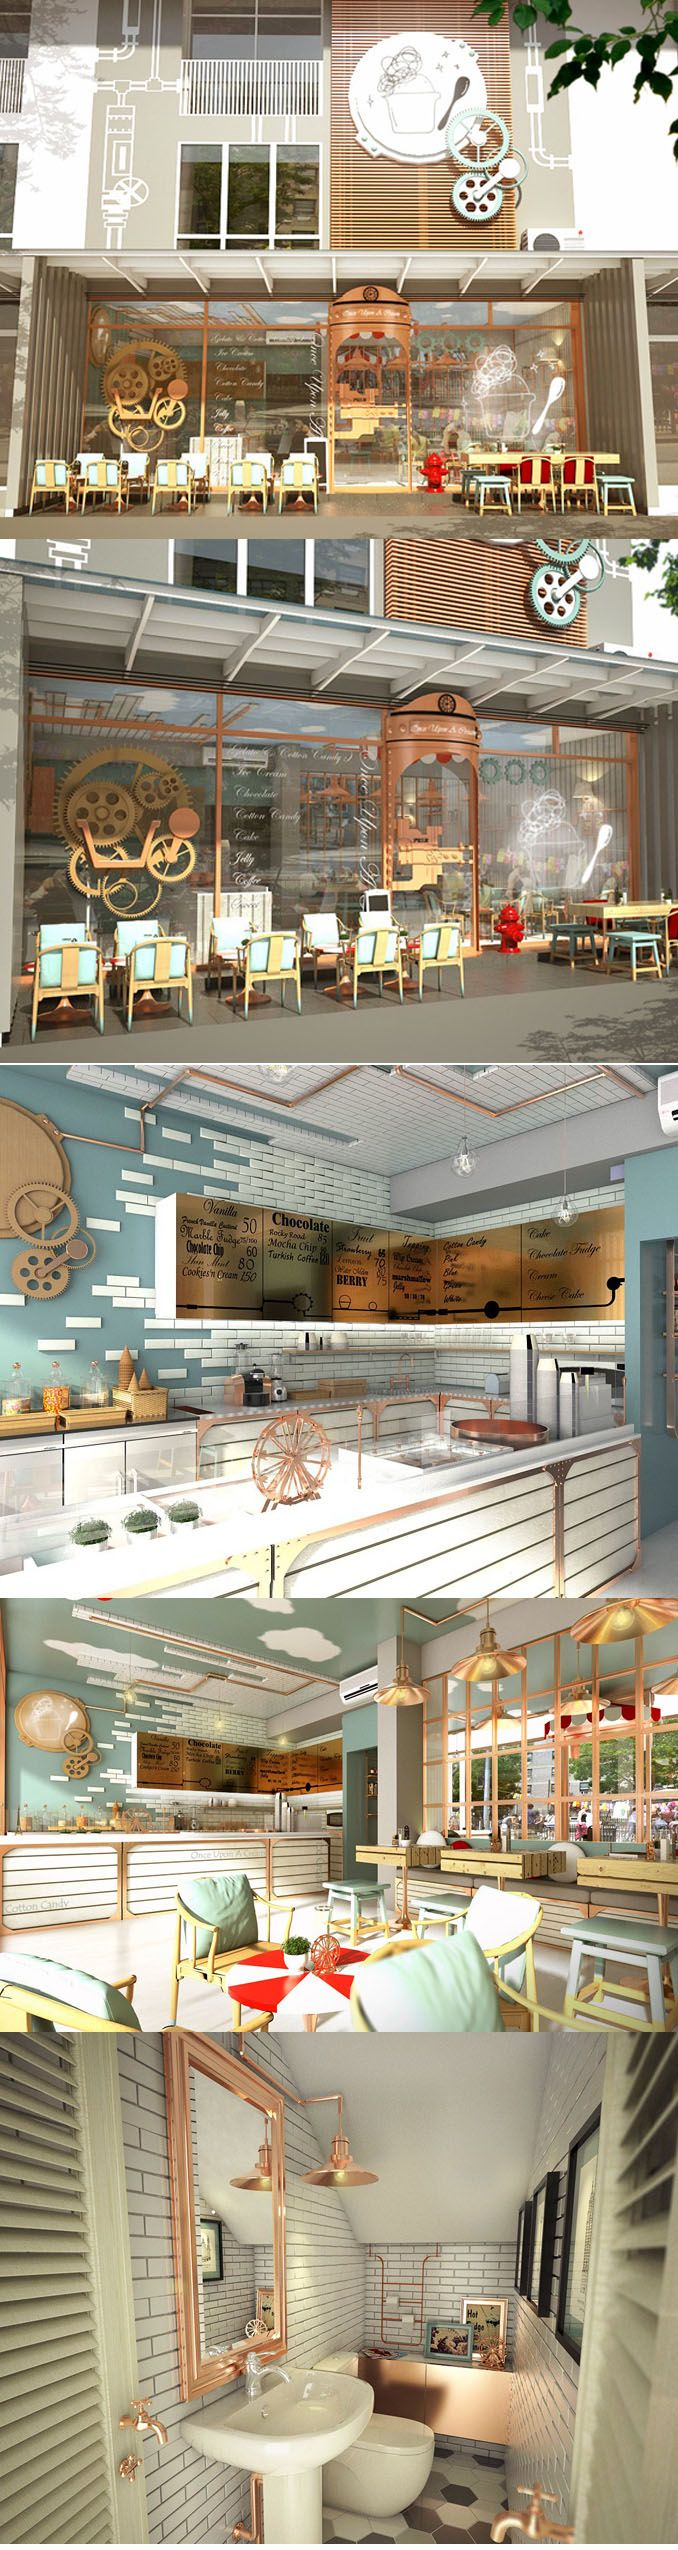 Once Upon A Cream ice-cream shop by MADA, Hua Hin – Thailand.